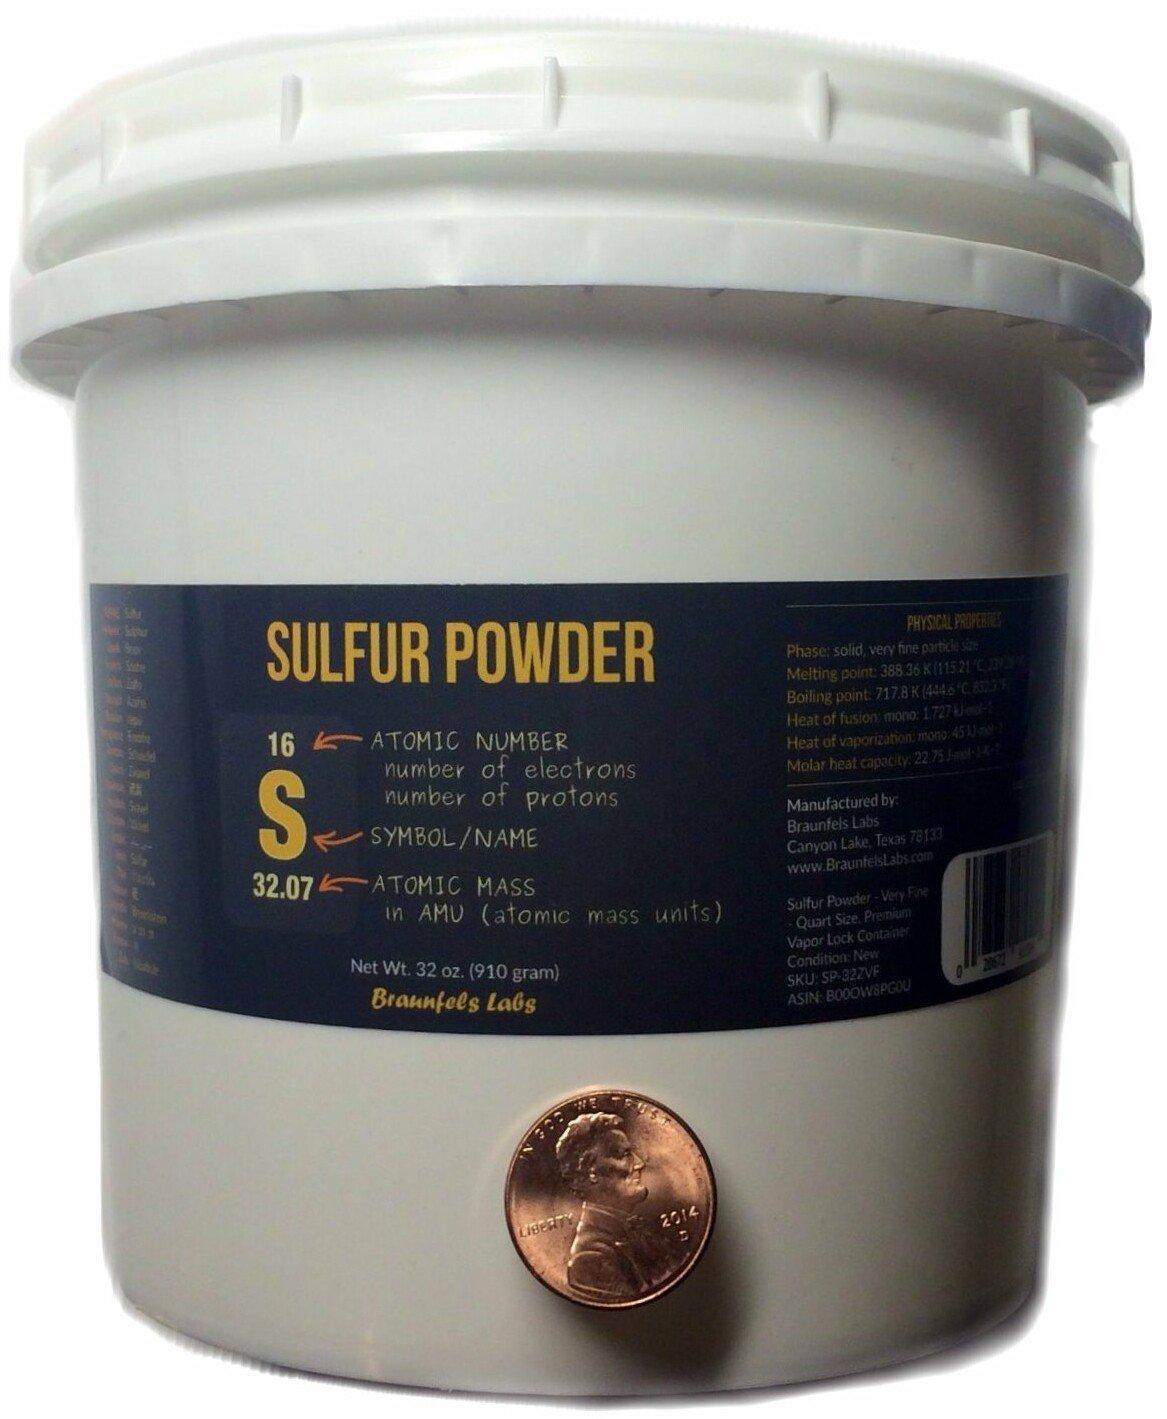 Vapor Lock QUART - Sulfur Powder - Very Fine - Premium, 32 oz - 2 Pounds